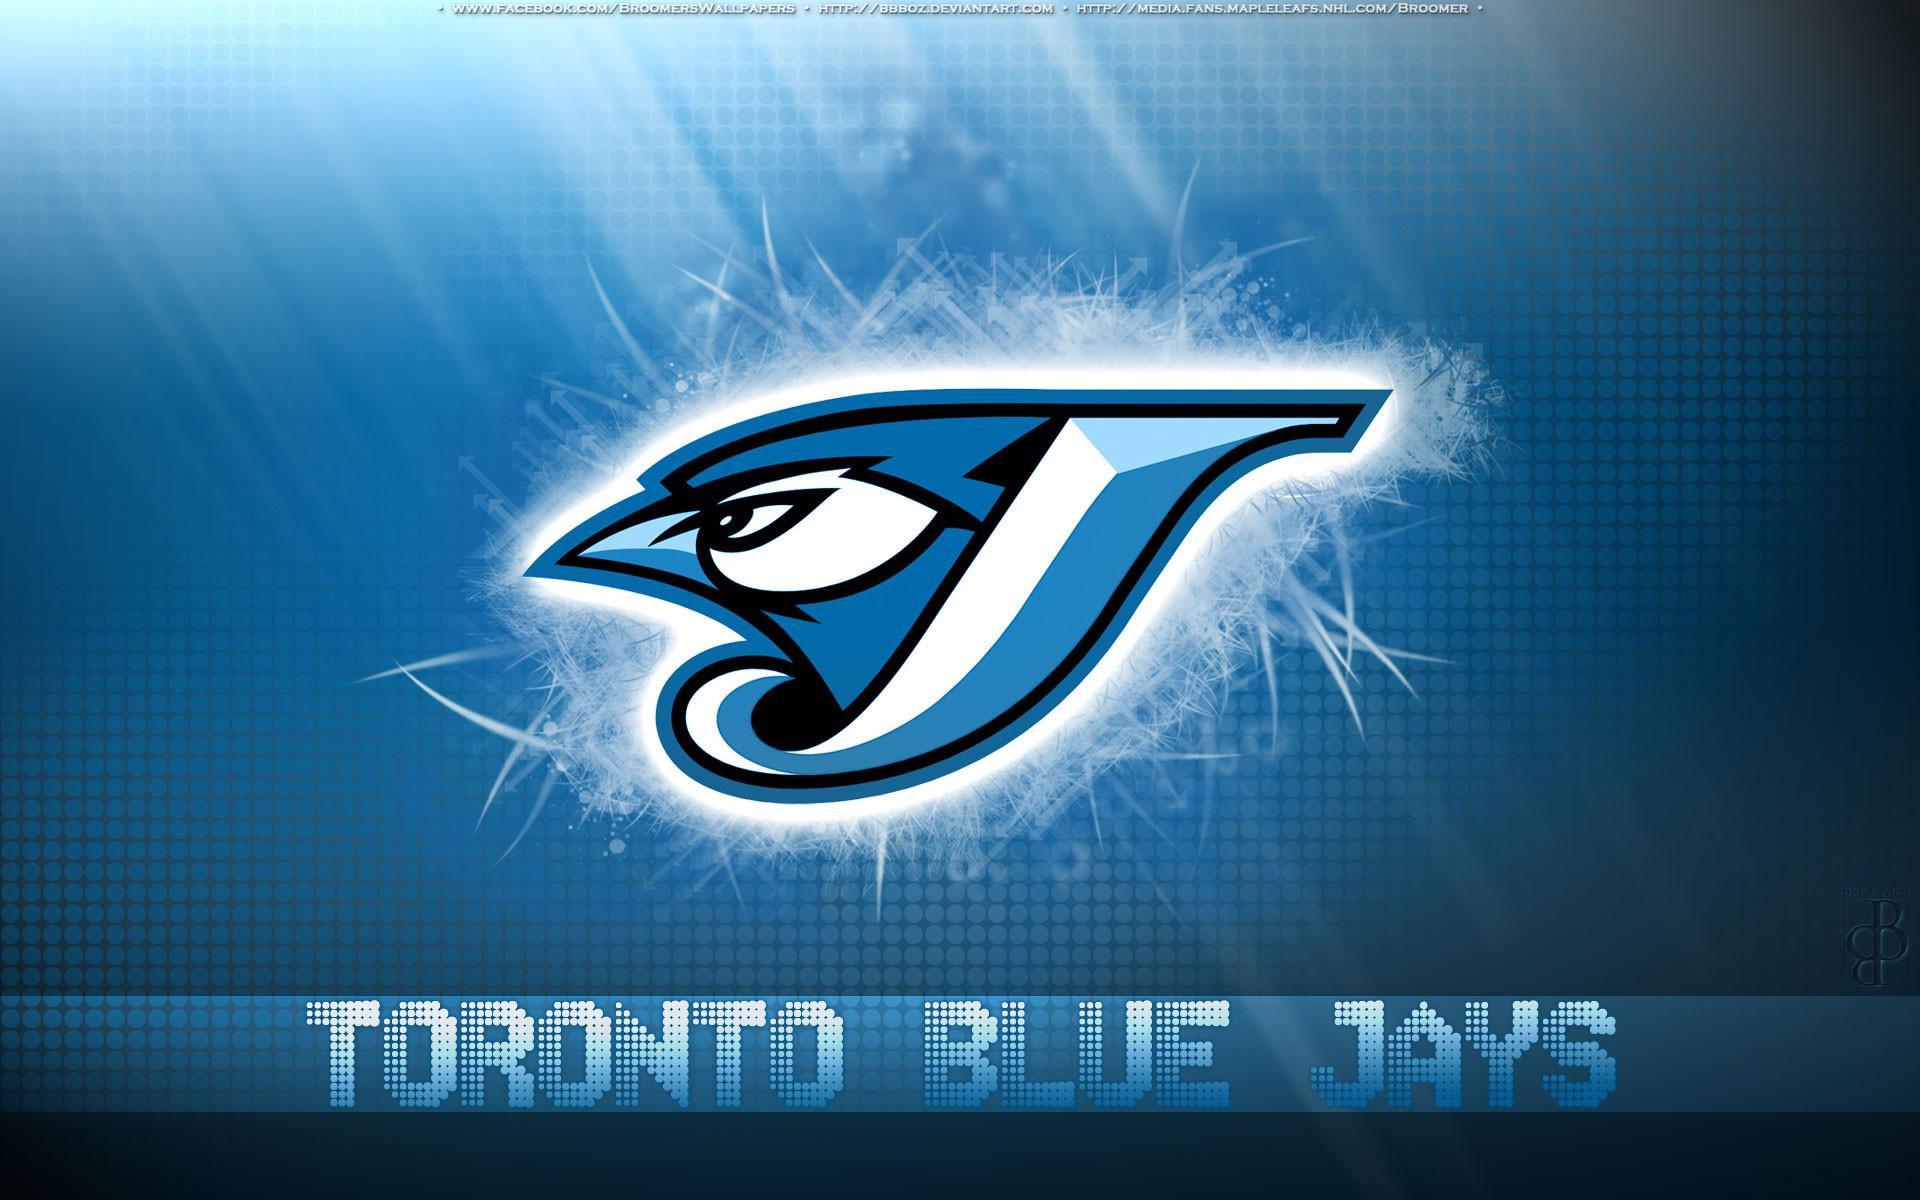 TORONTO BLUE JAYS mlb baseball (11) wallpaper | | 228024 |  WallpaperUP